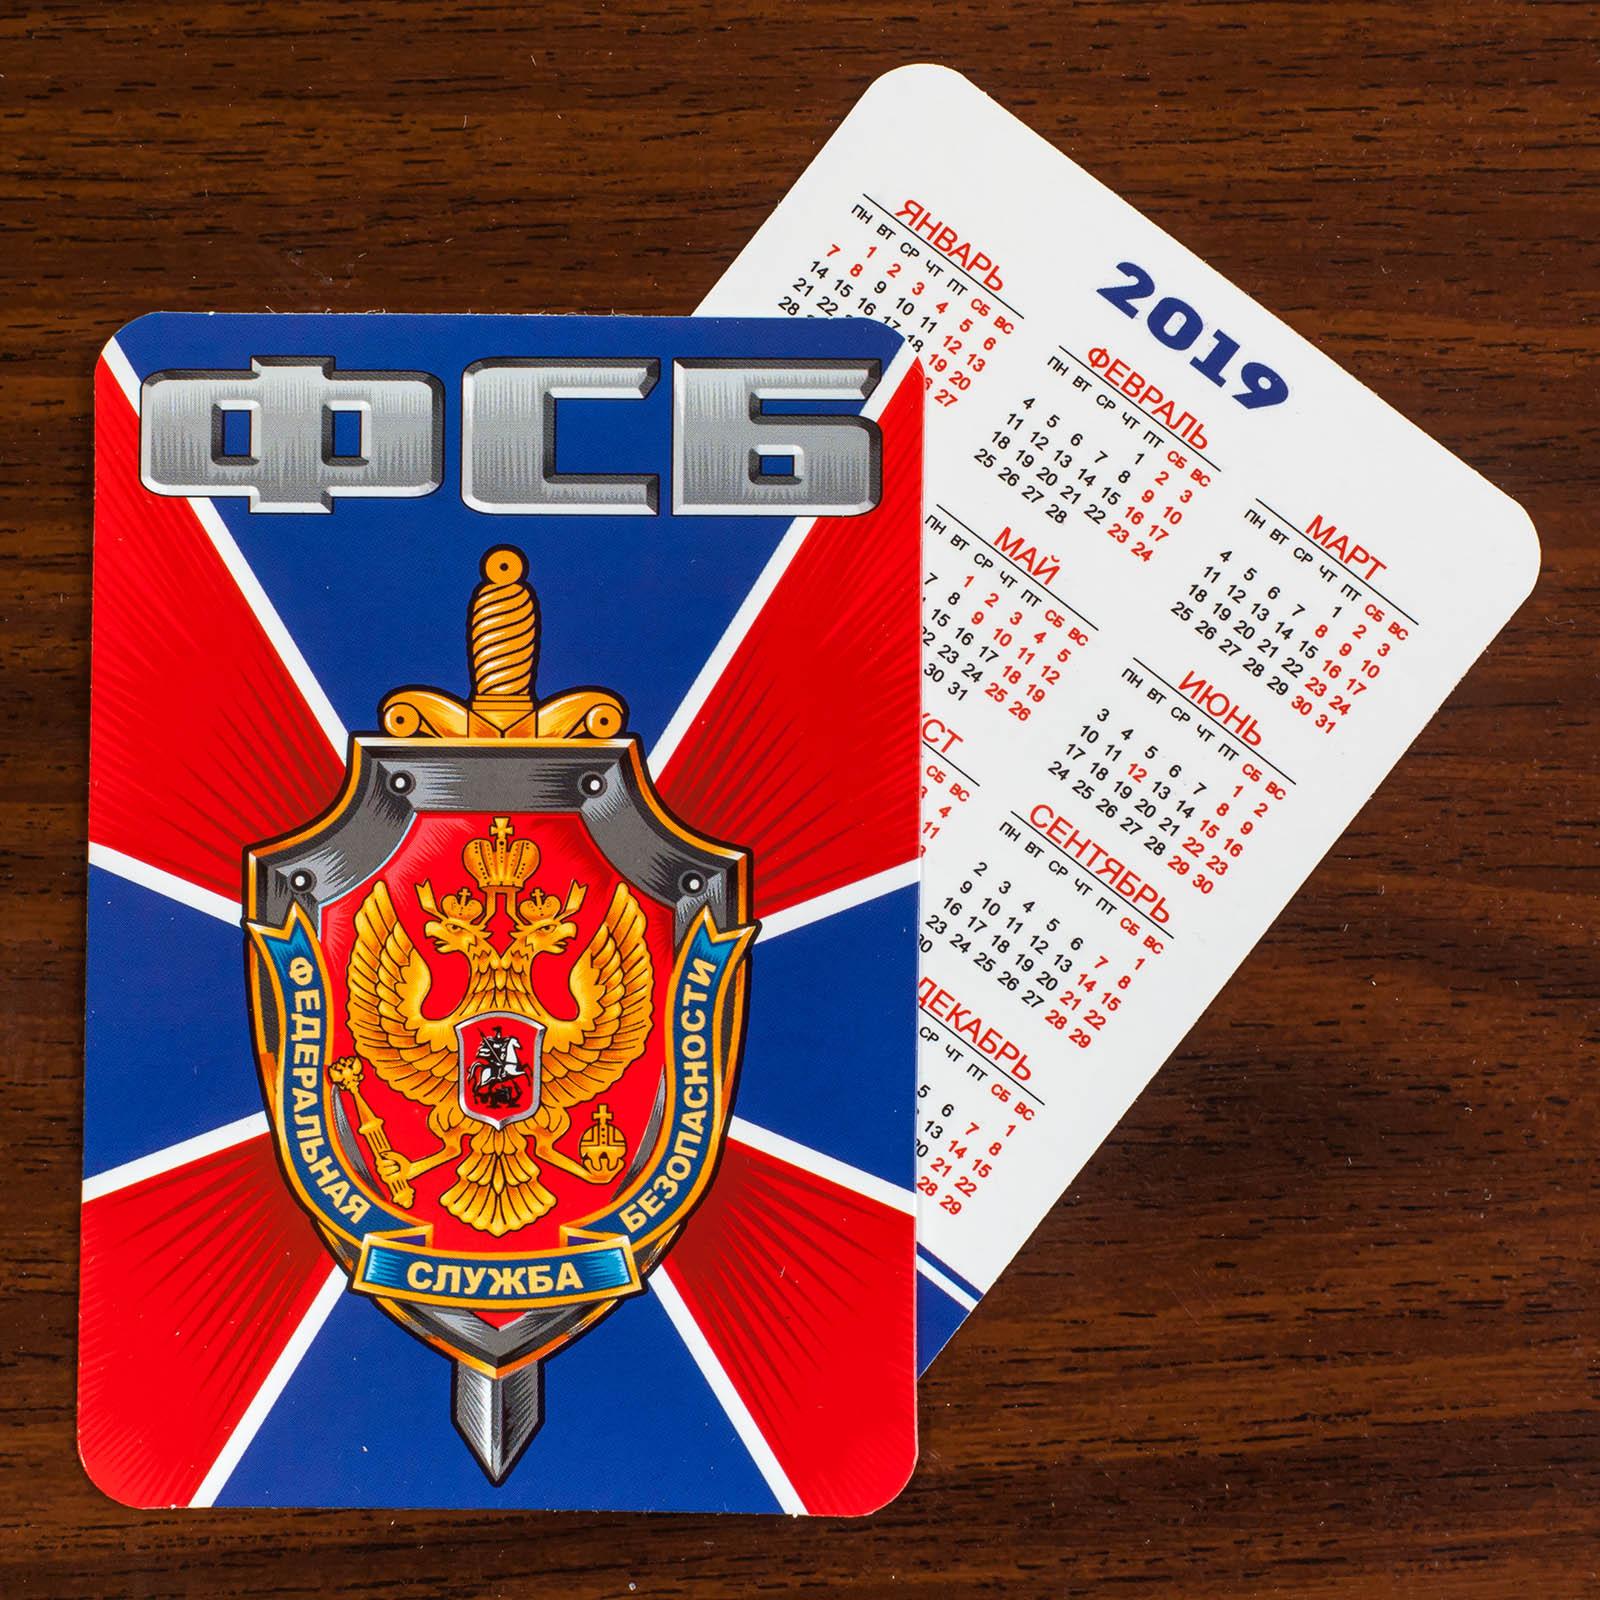 Карманный календарь ФСБ на 2019 год